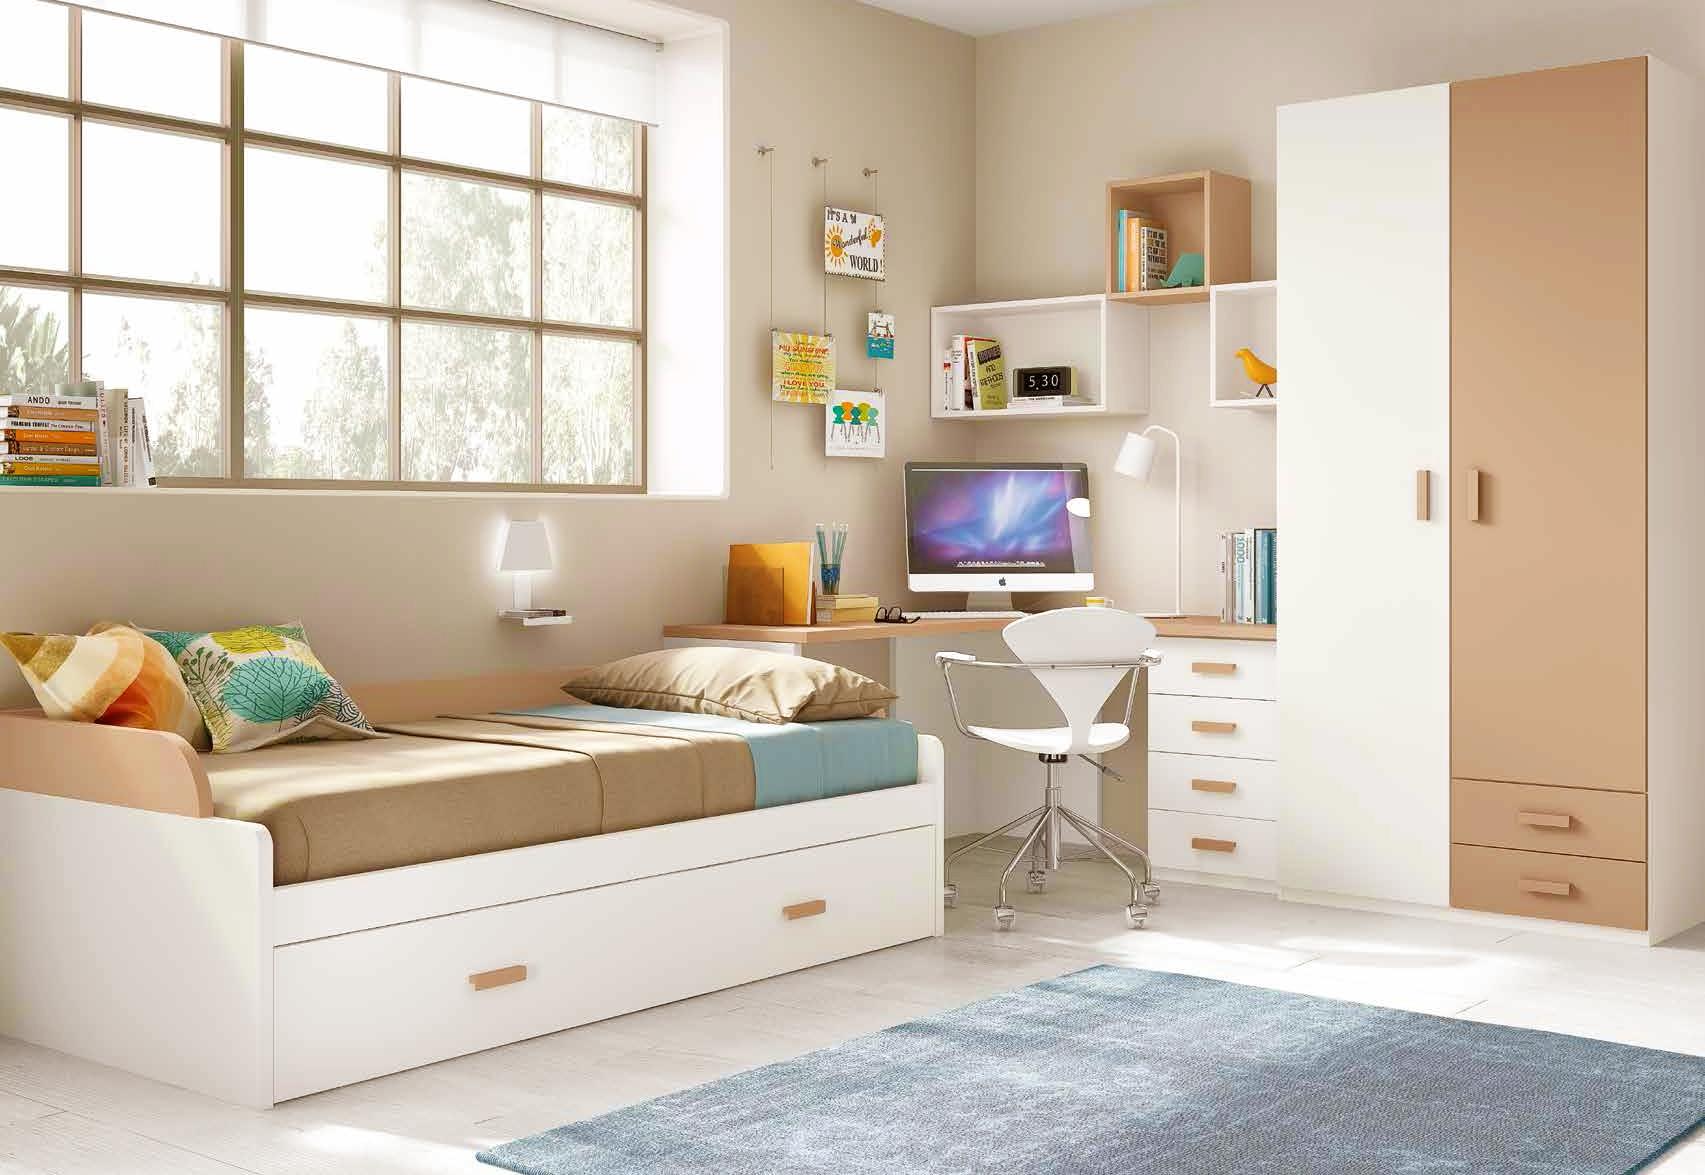 lit estrade conforama great ladolly lit mezzanine x cm bureau tagres armoire bois with lit. Black Bedroom Furniture Sets. Home Design Ideas